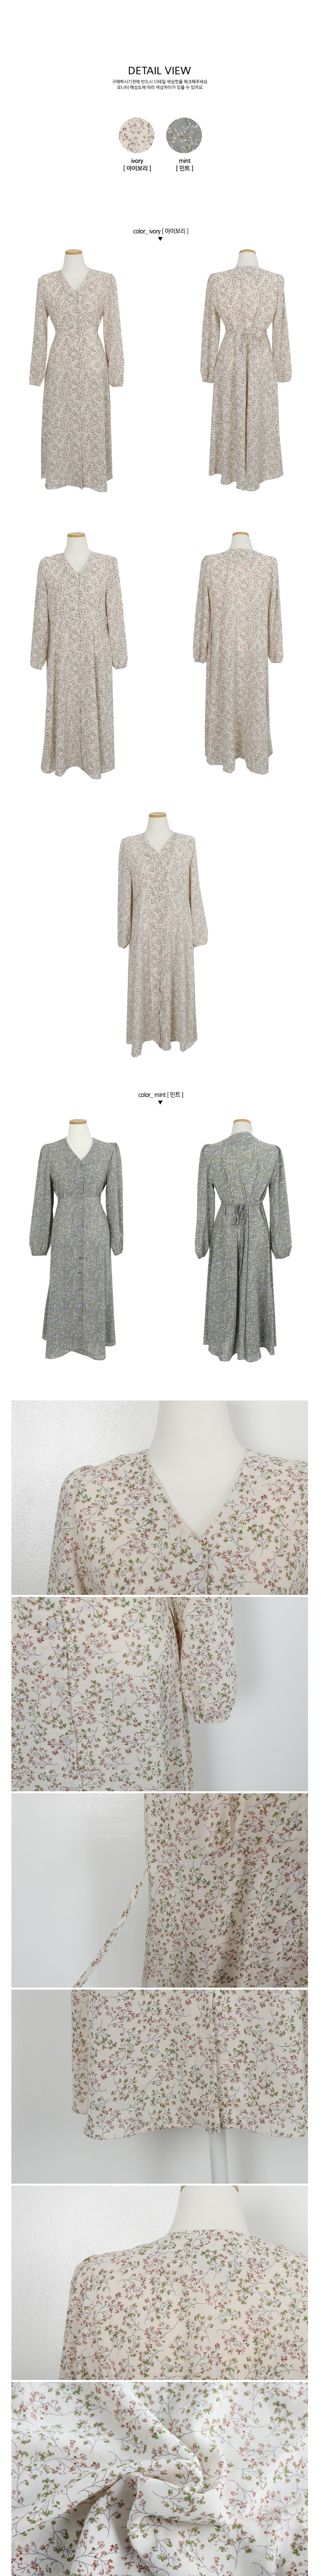 Ravenblong Dress